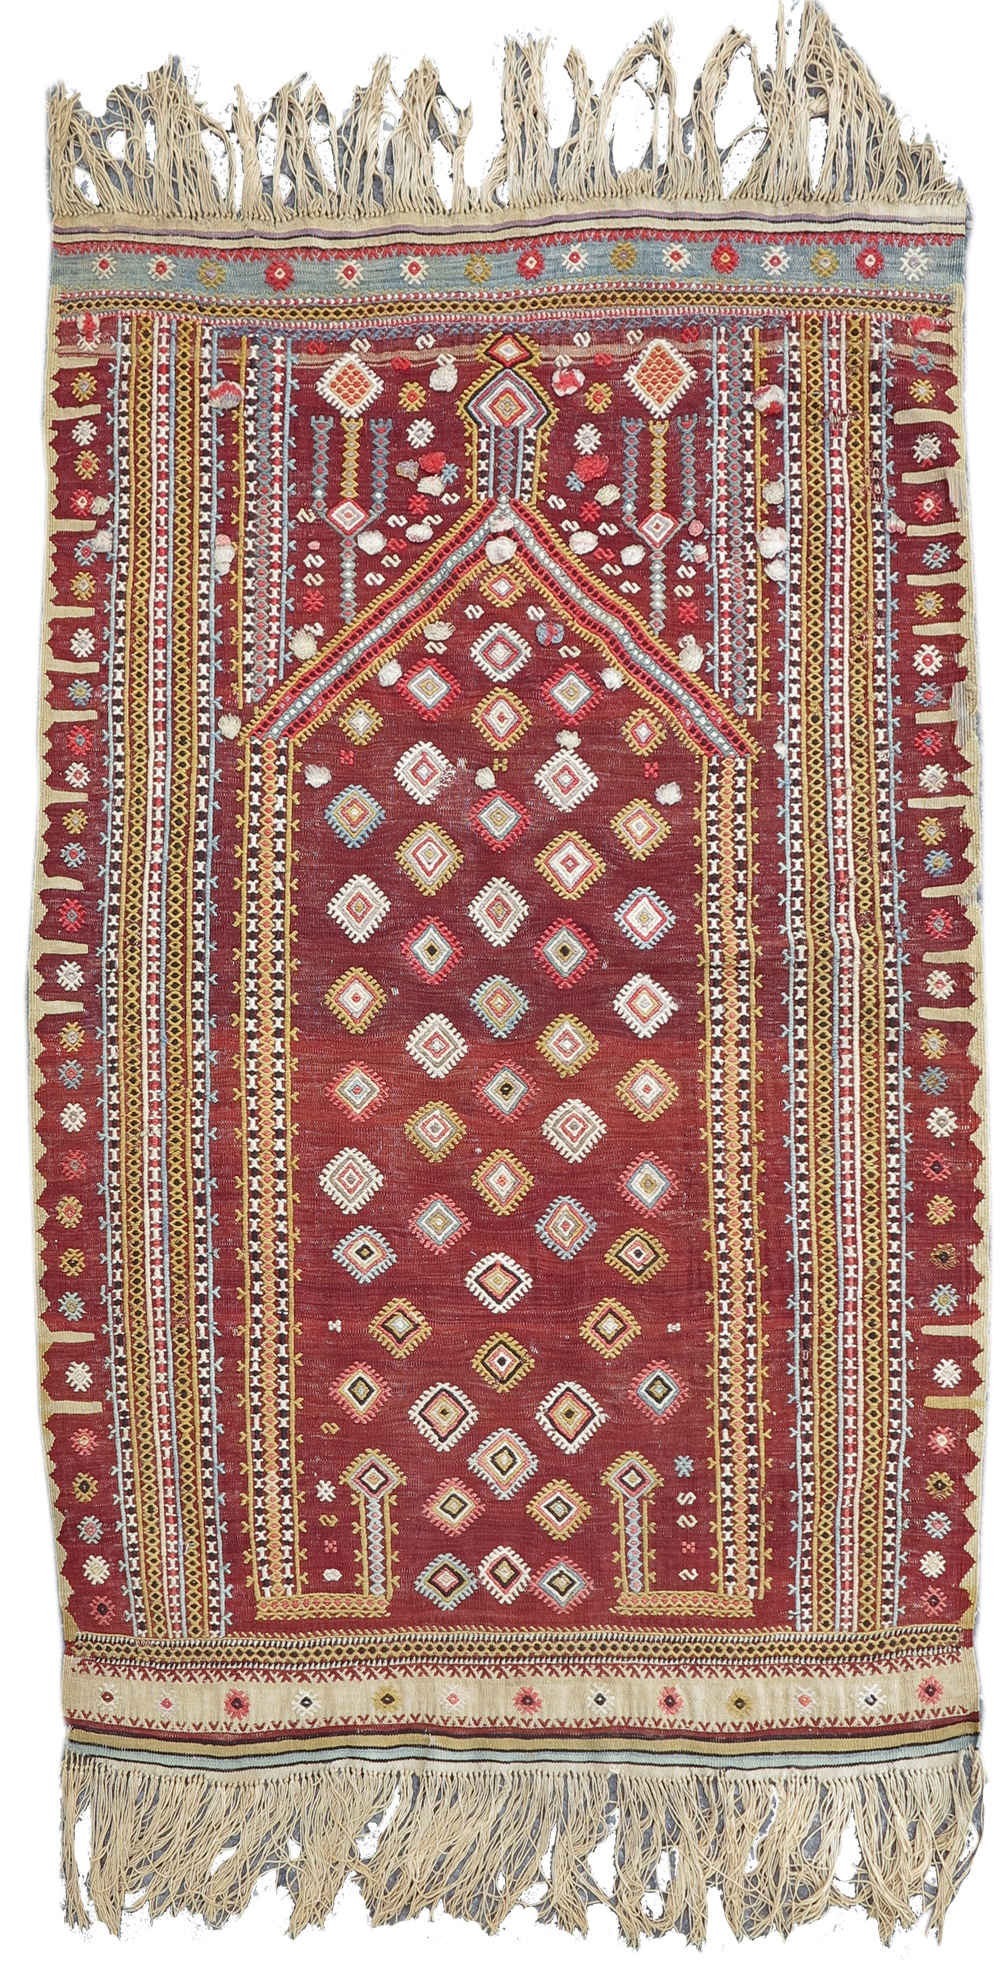 Zili Prayer rug